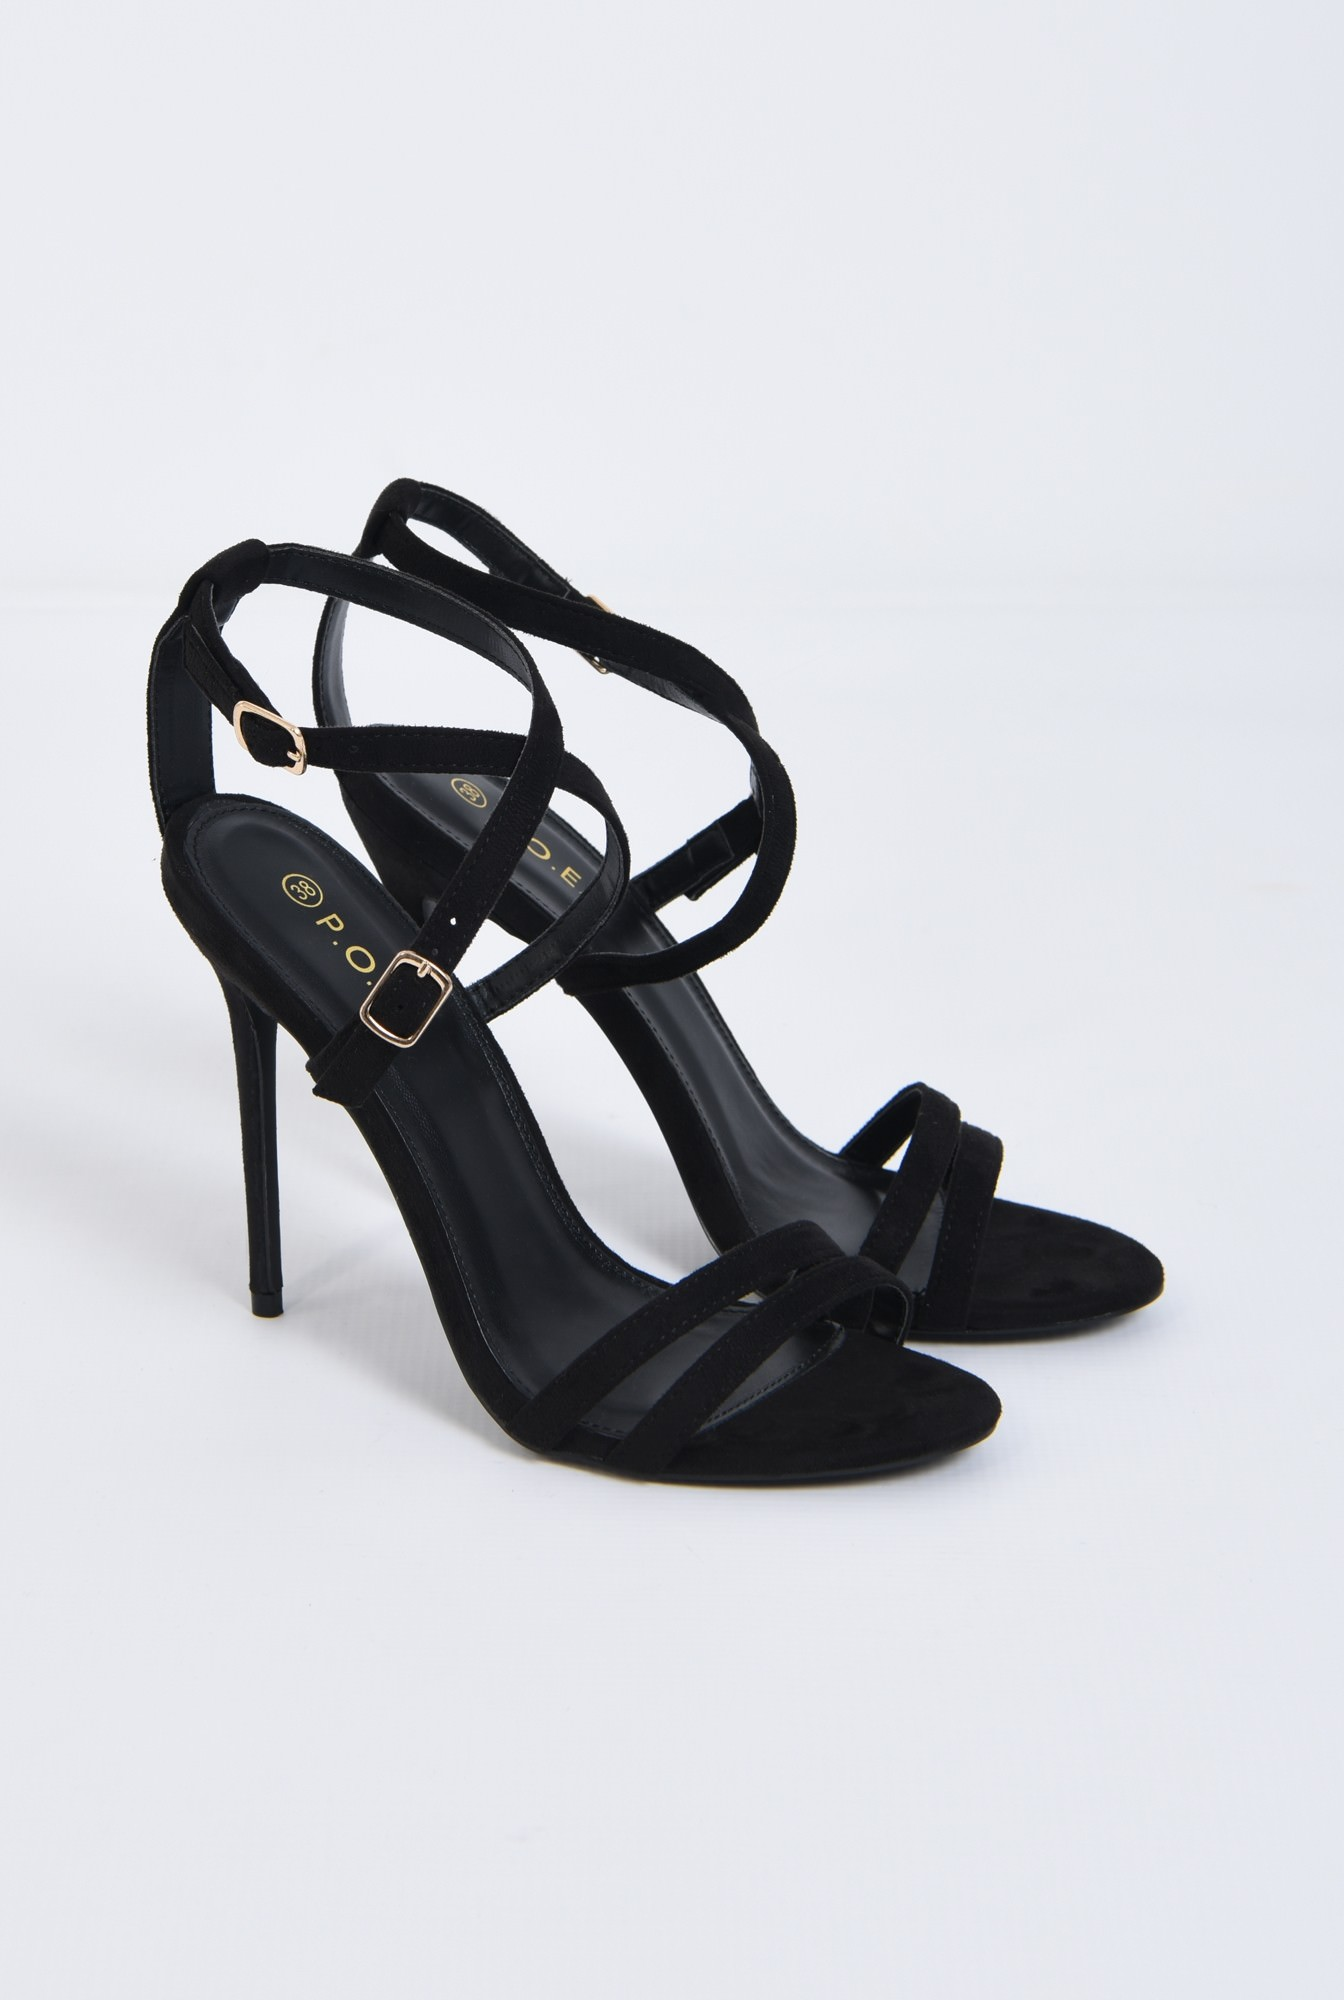 2 - sandale elegante, negru, stiletto, catifea